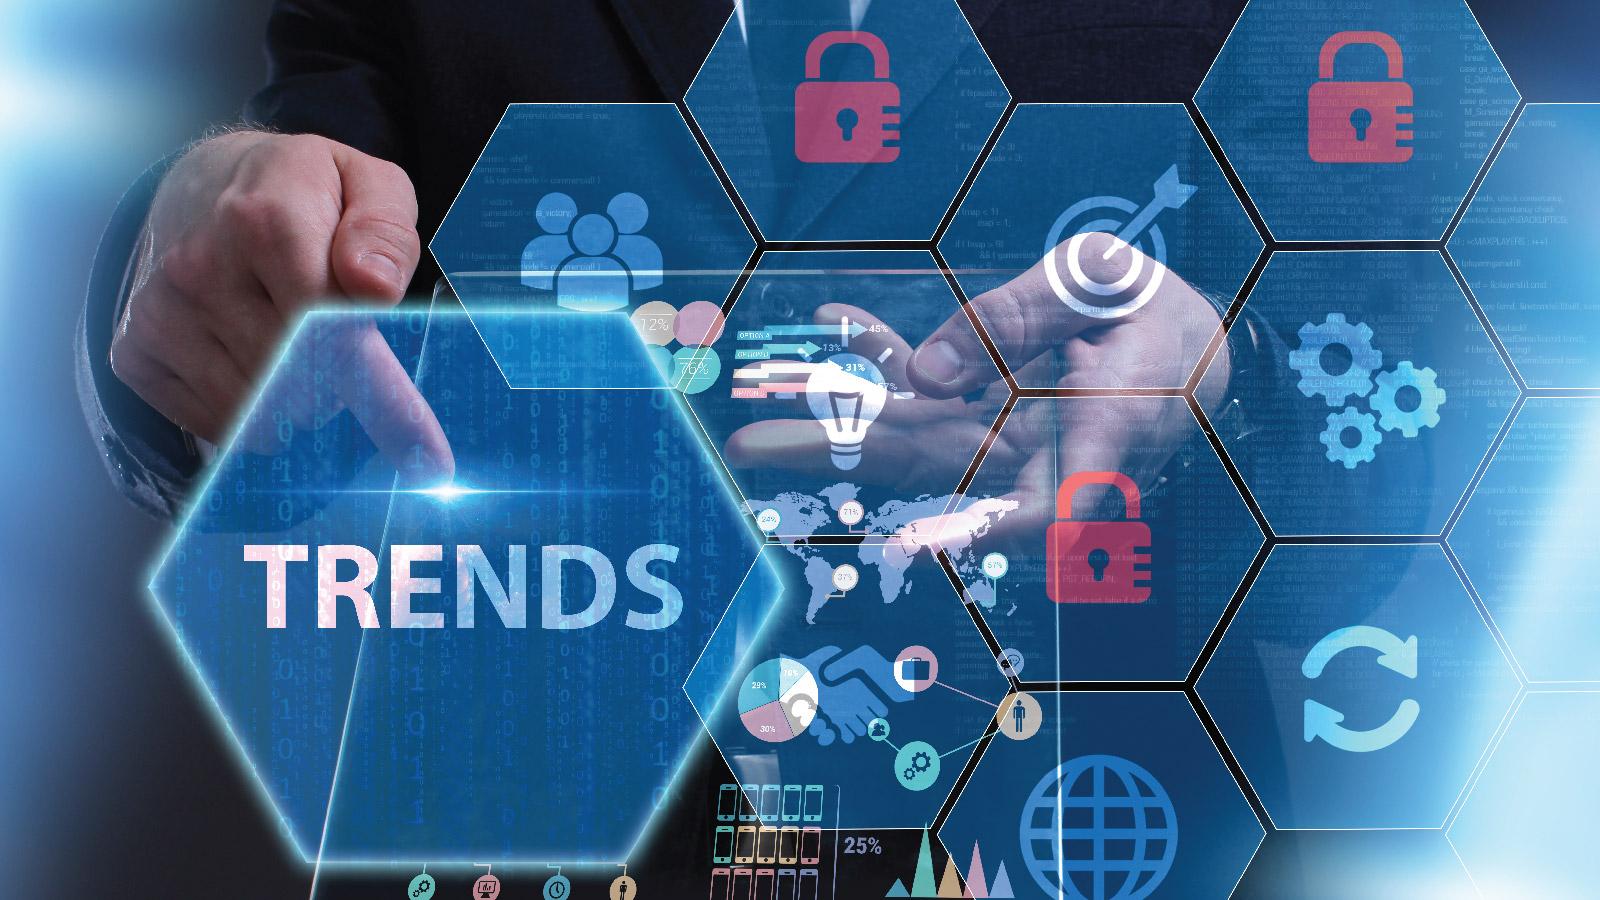 2020 Tech Trends.Five Emerging Technology Trends For 2020 Enterprisetalk